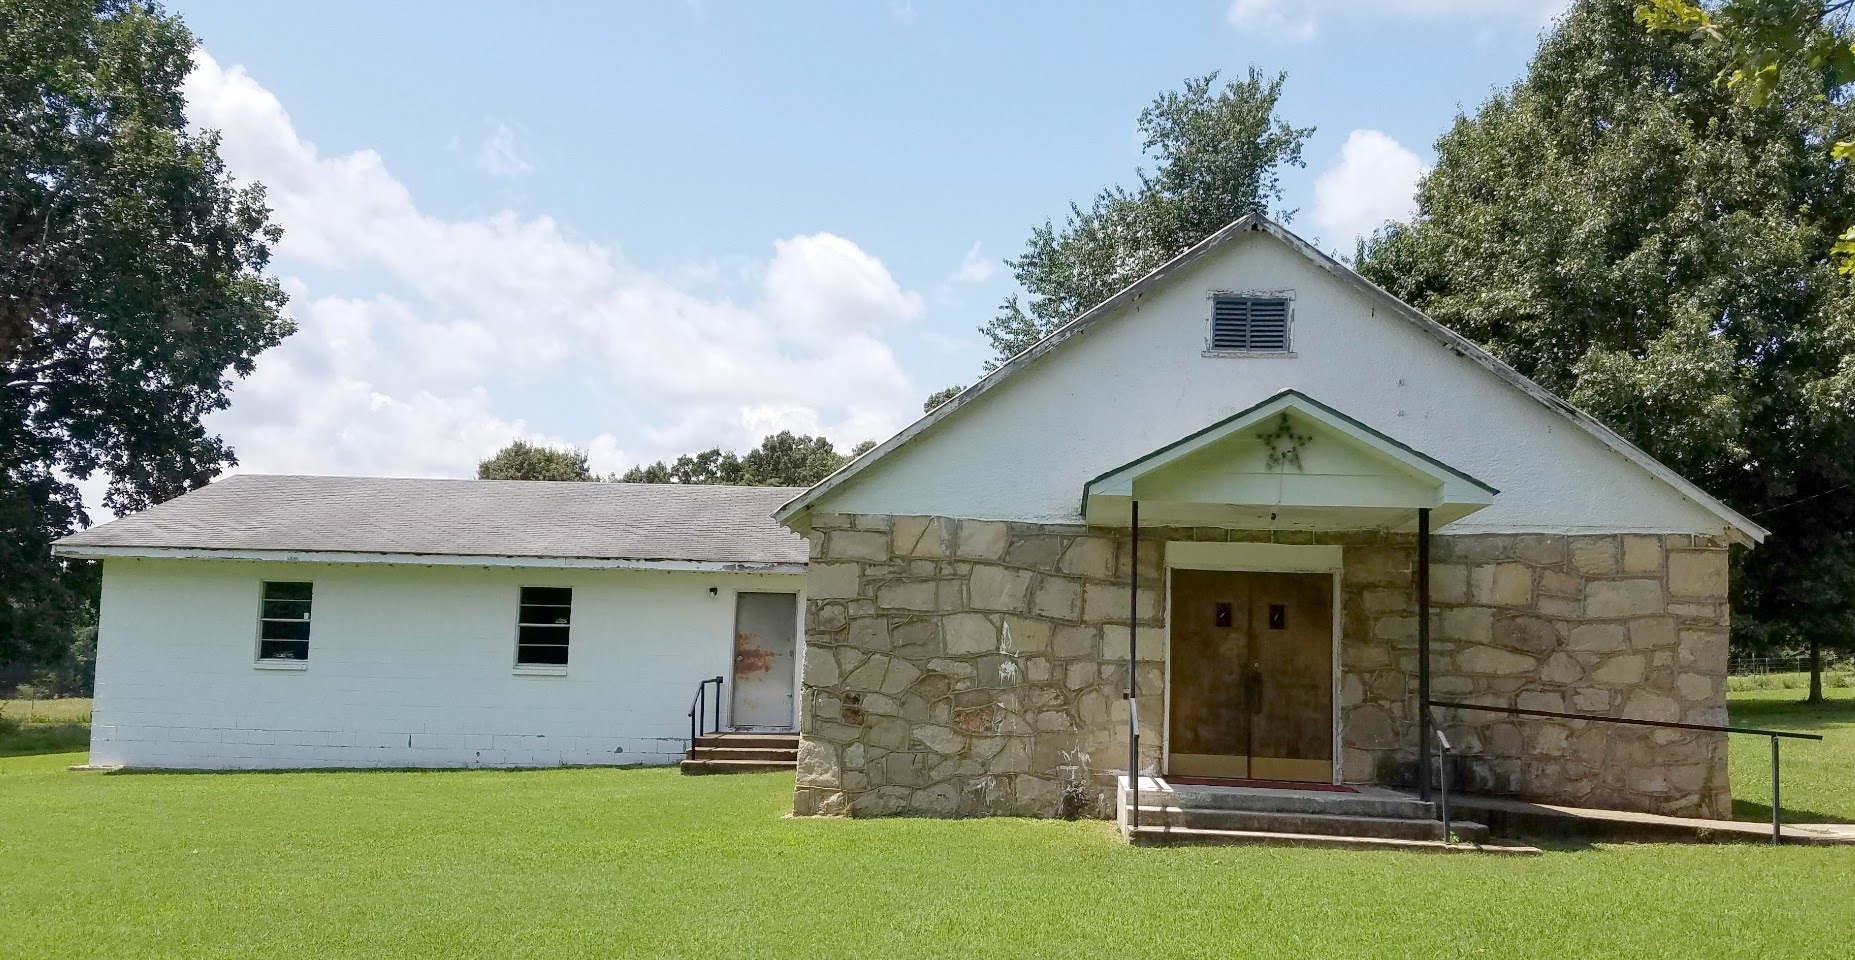 Pilgrims Rest Baptist Church